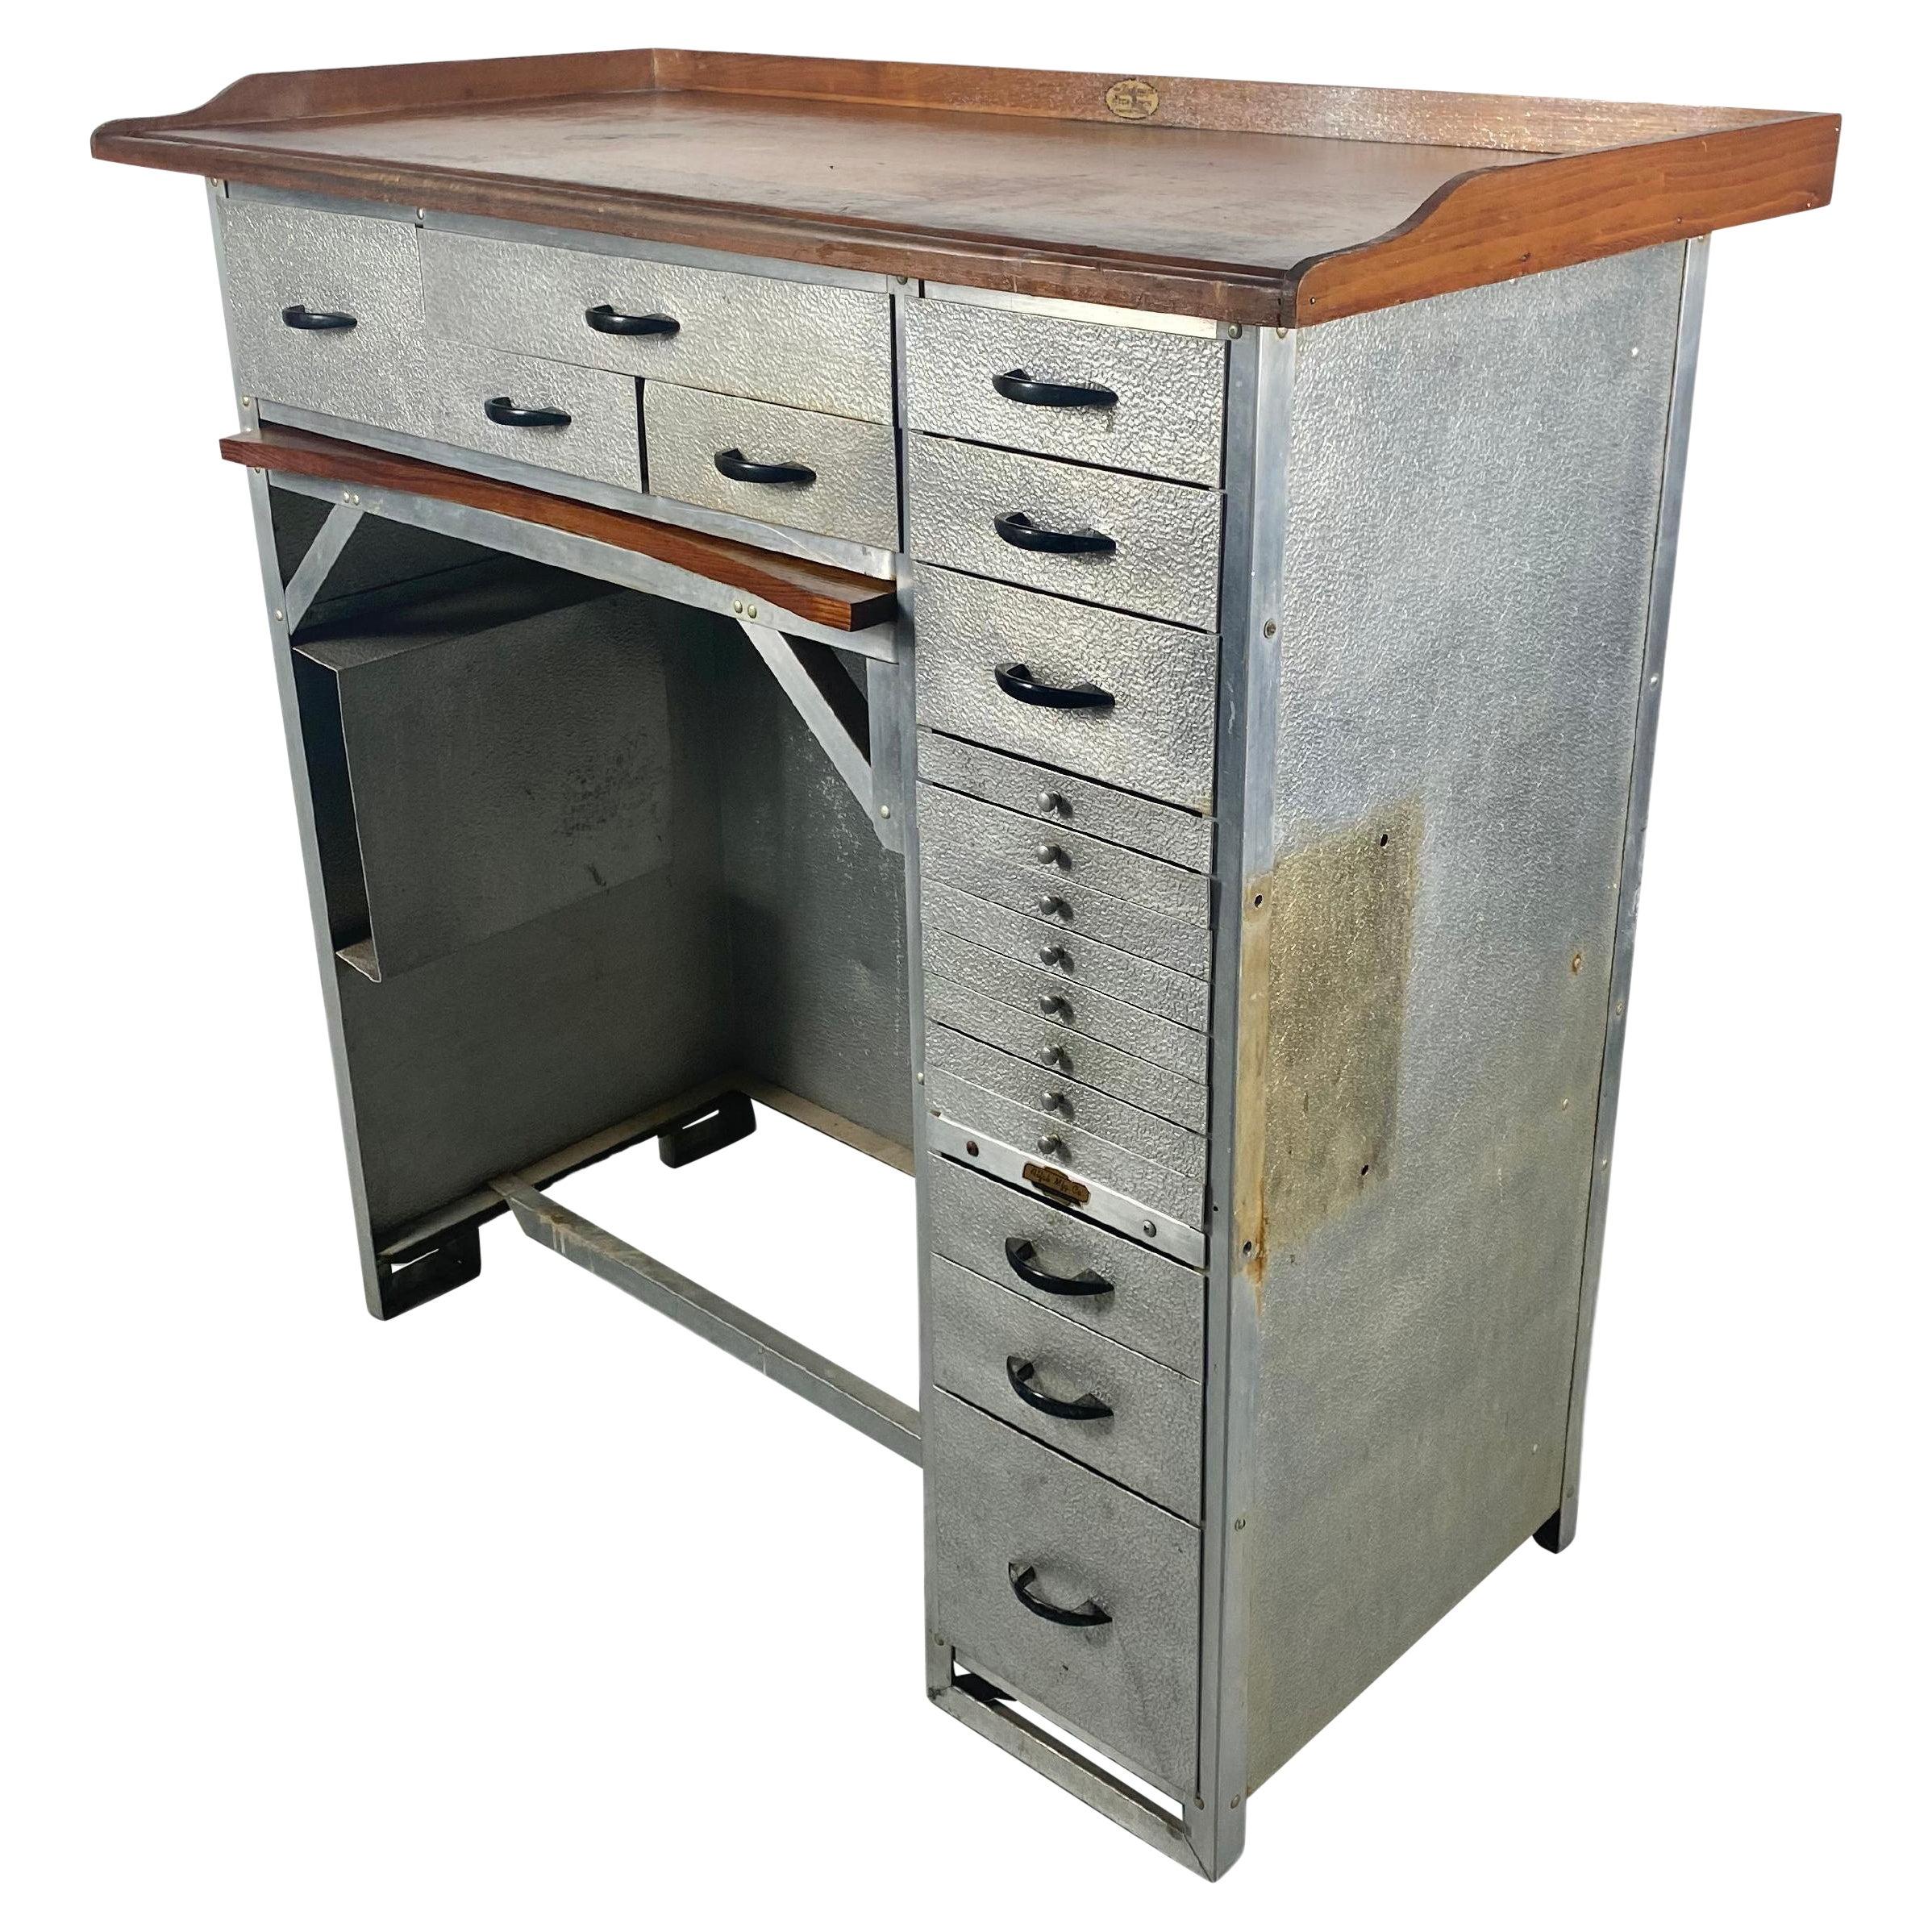 Vintage ,Industrial, Aluminum Watchmaker's Desk, Manufactured by Alfab